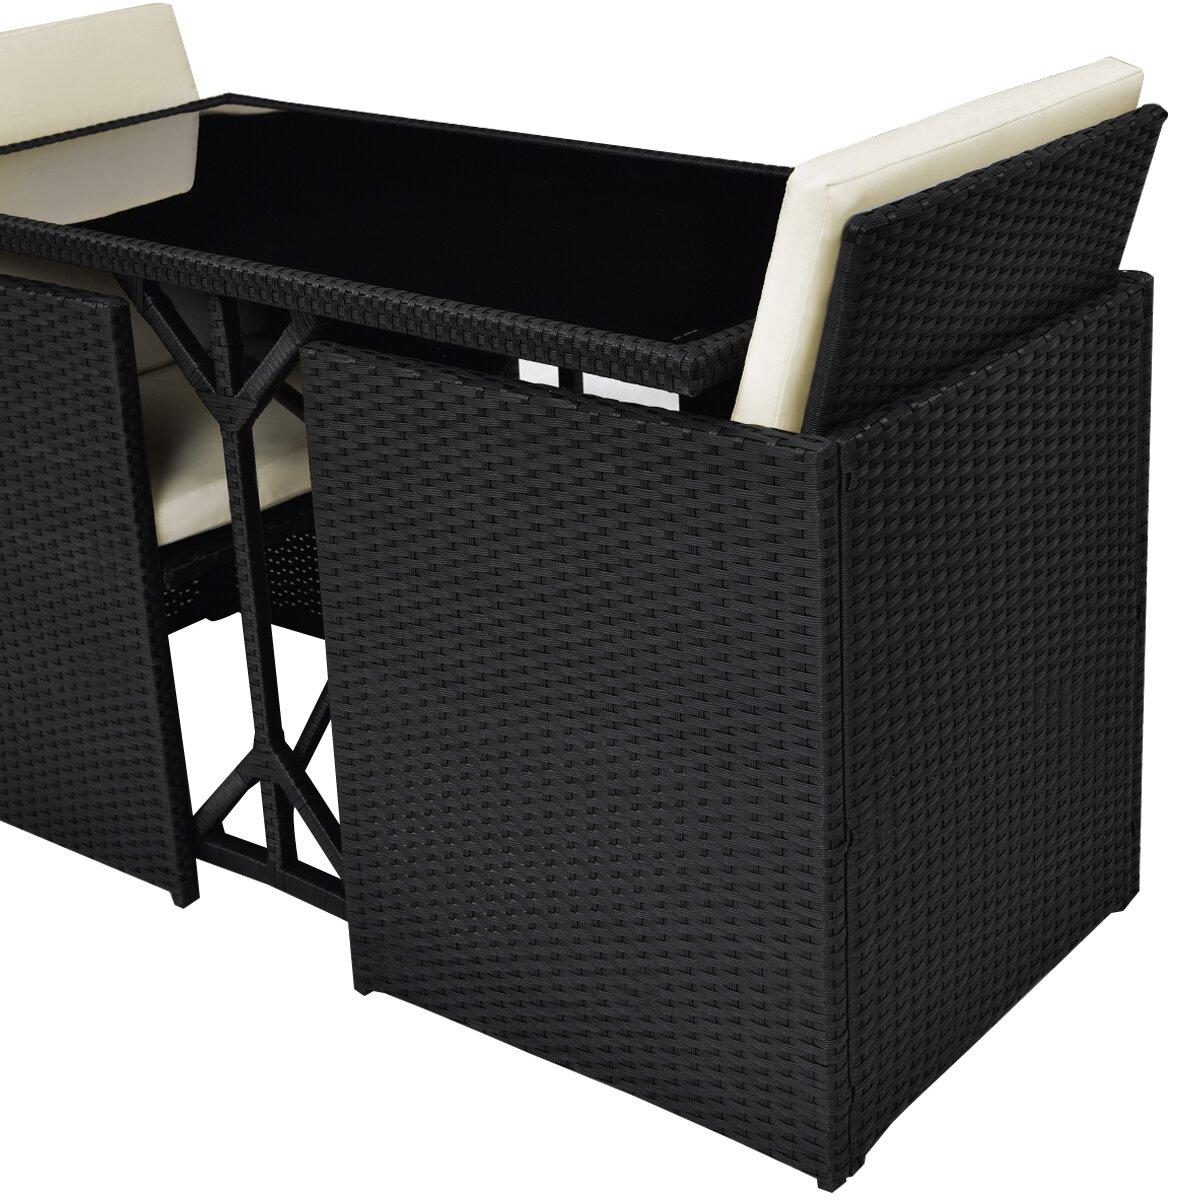 gymax 3 pc black rattan furniture